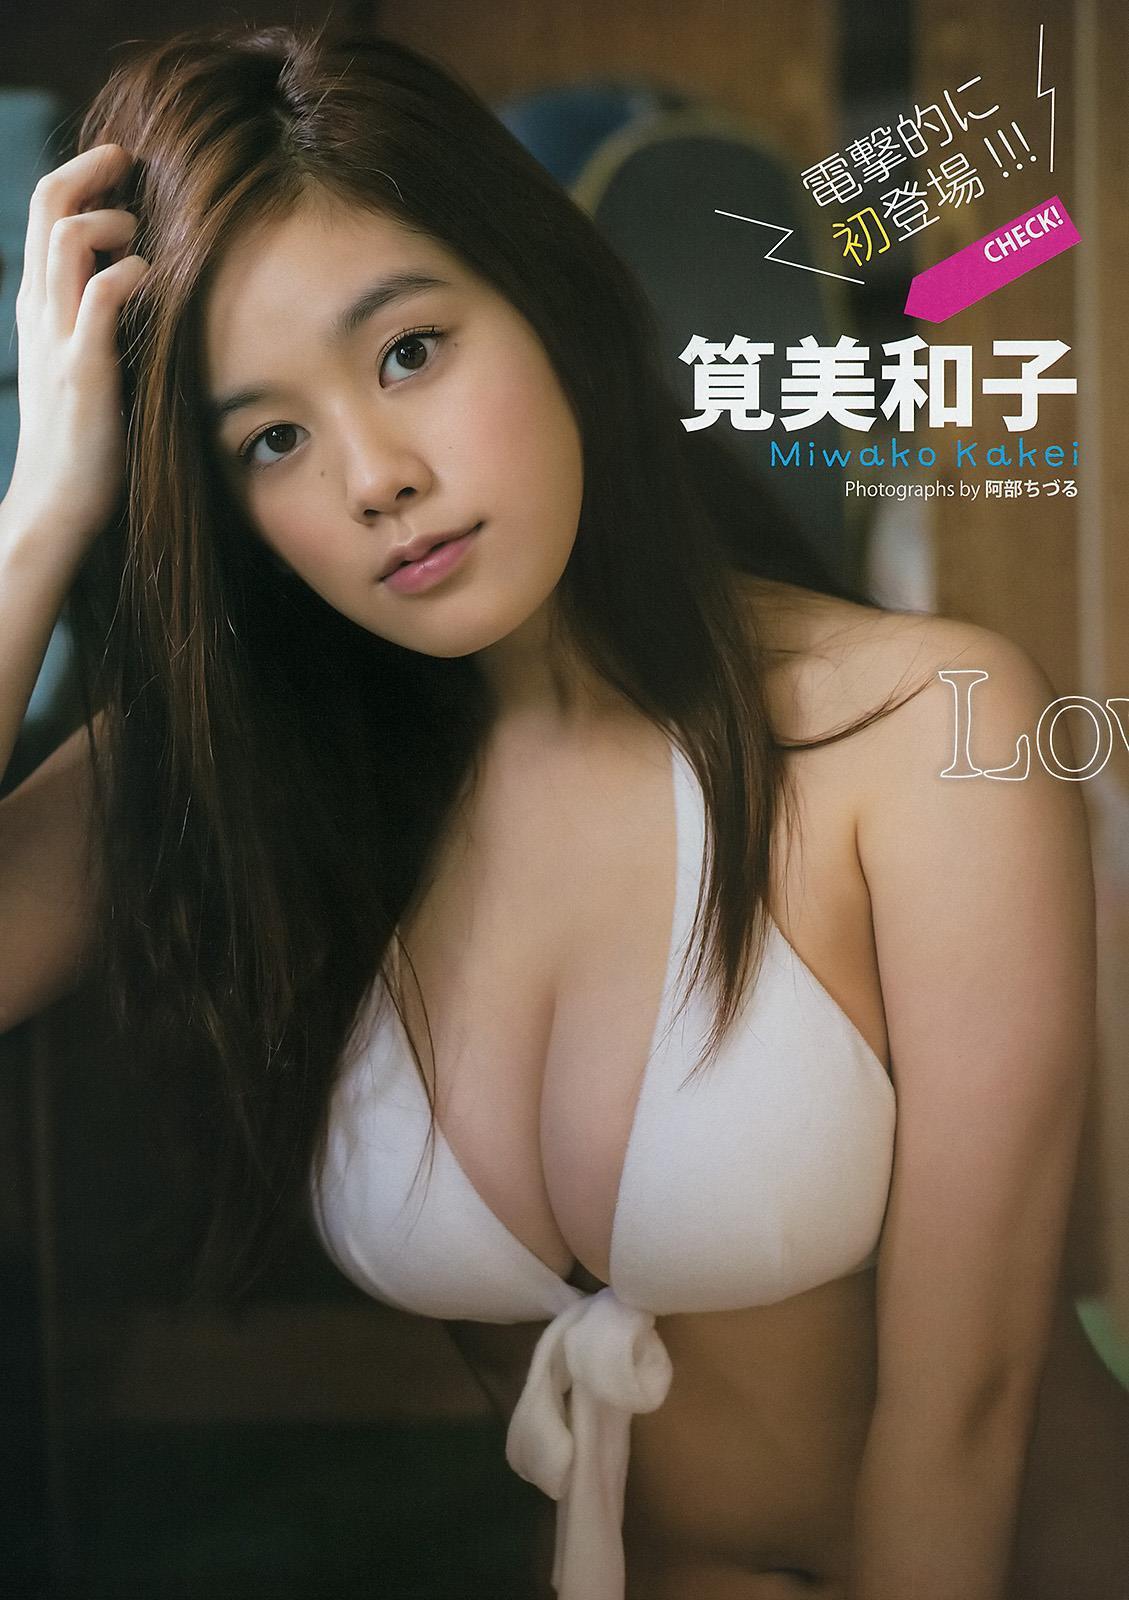 kakei_miwako172.jpg